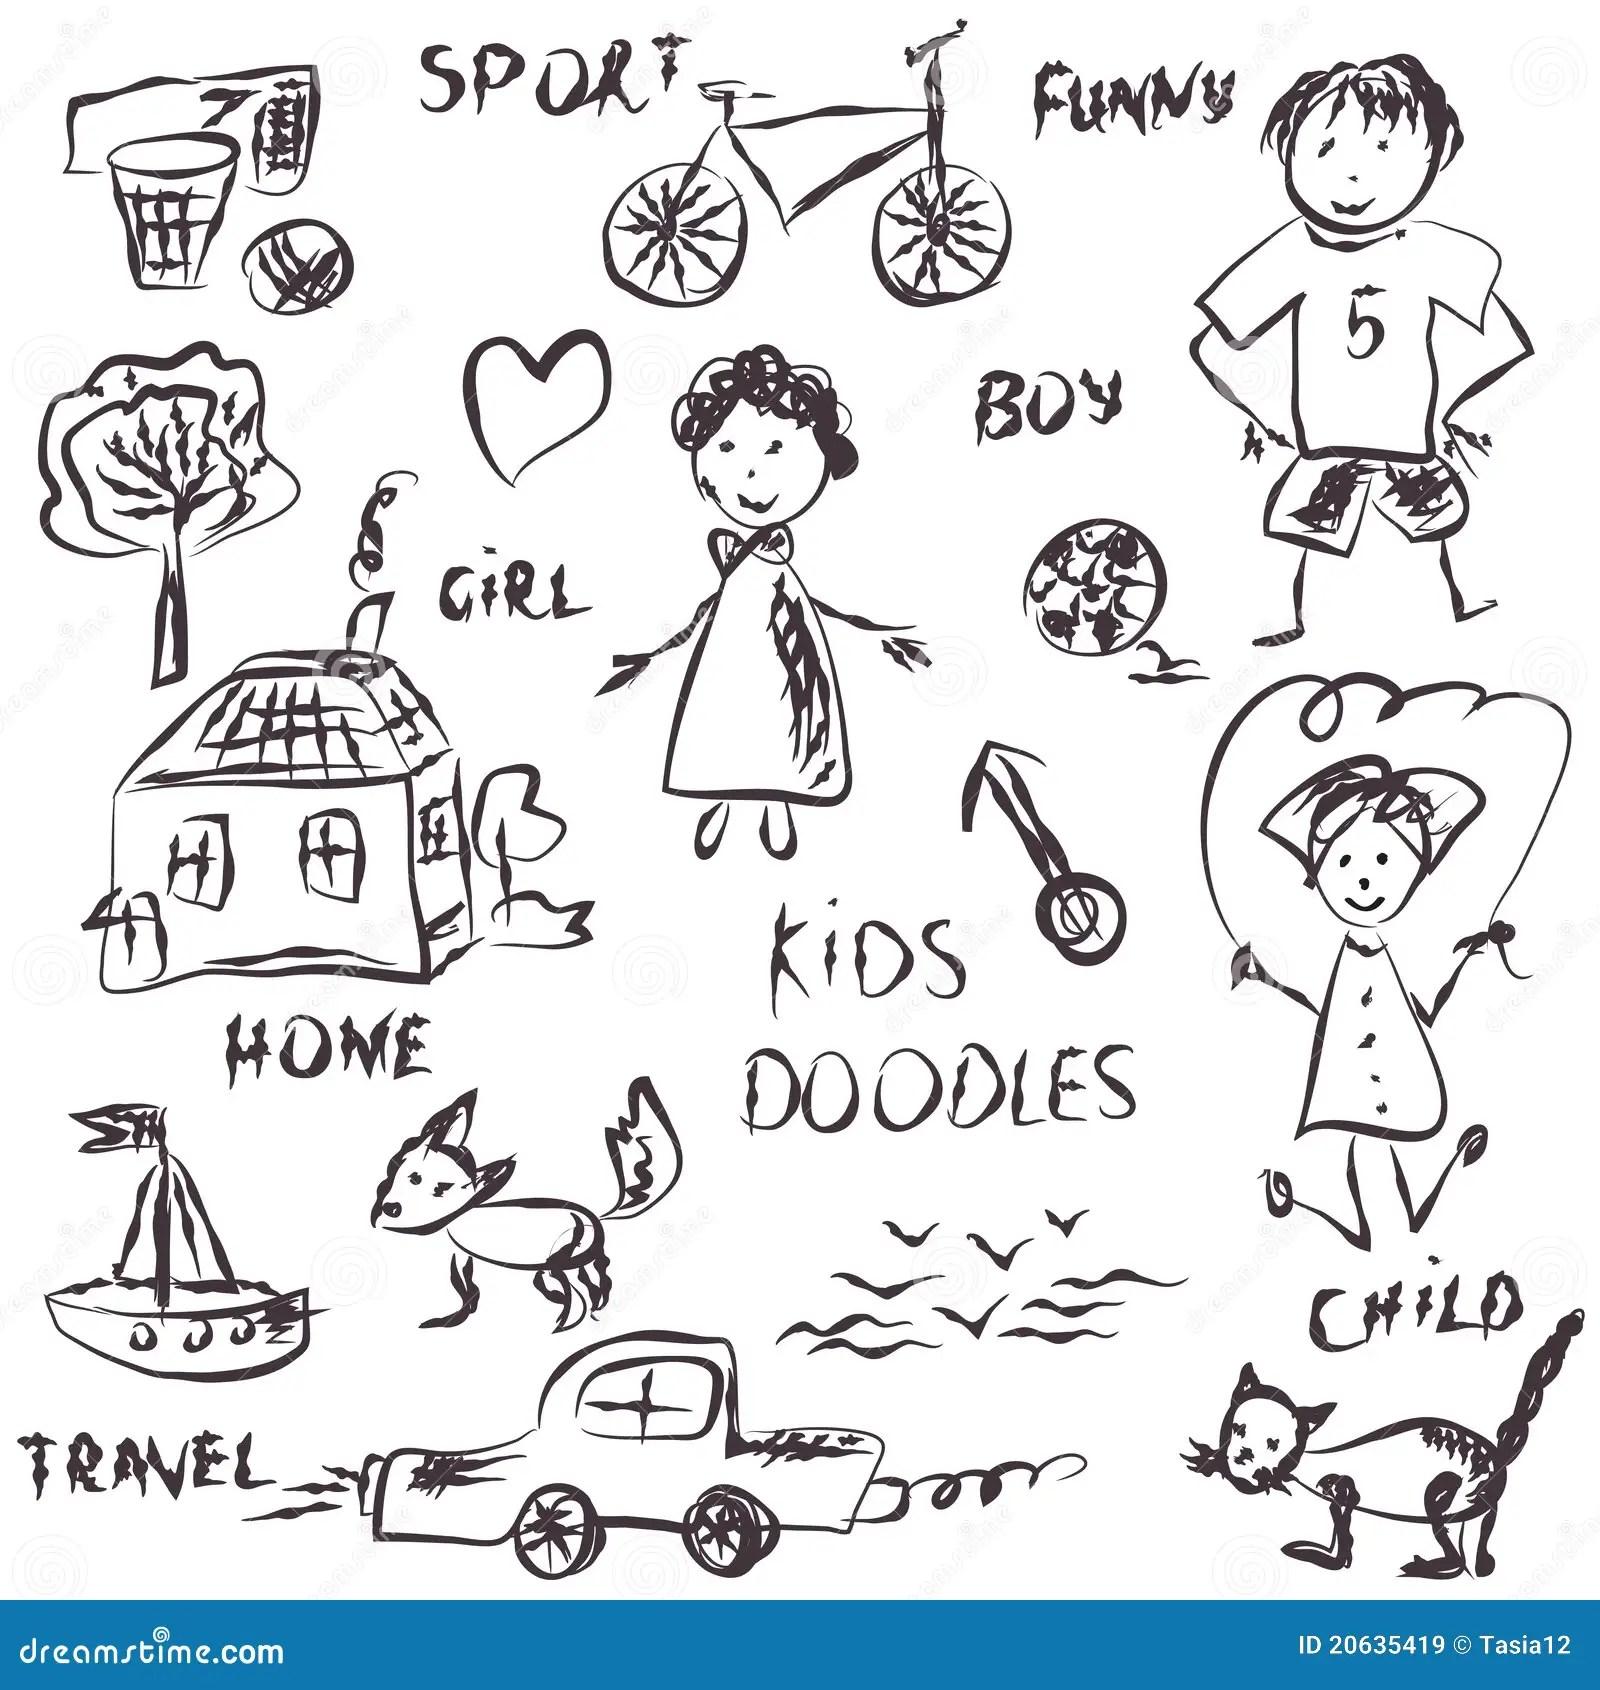 Kids Doodles Cartoon Royalty Free Stock Images